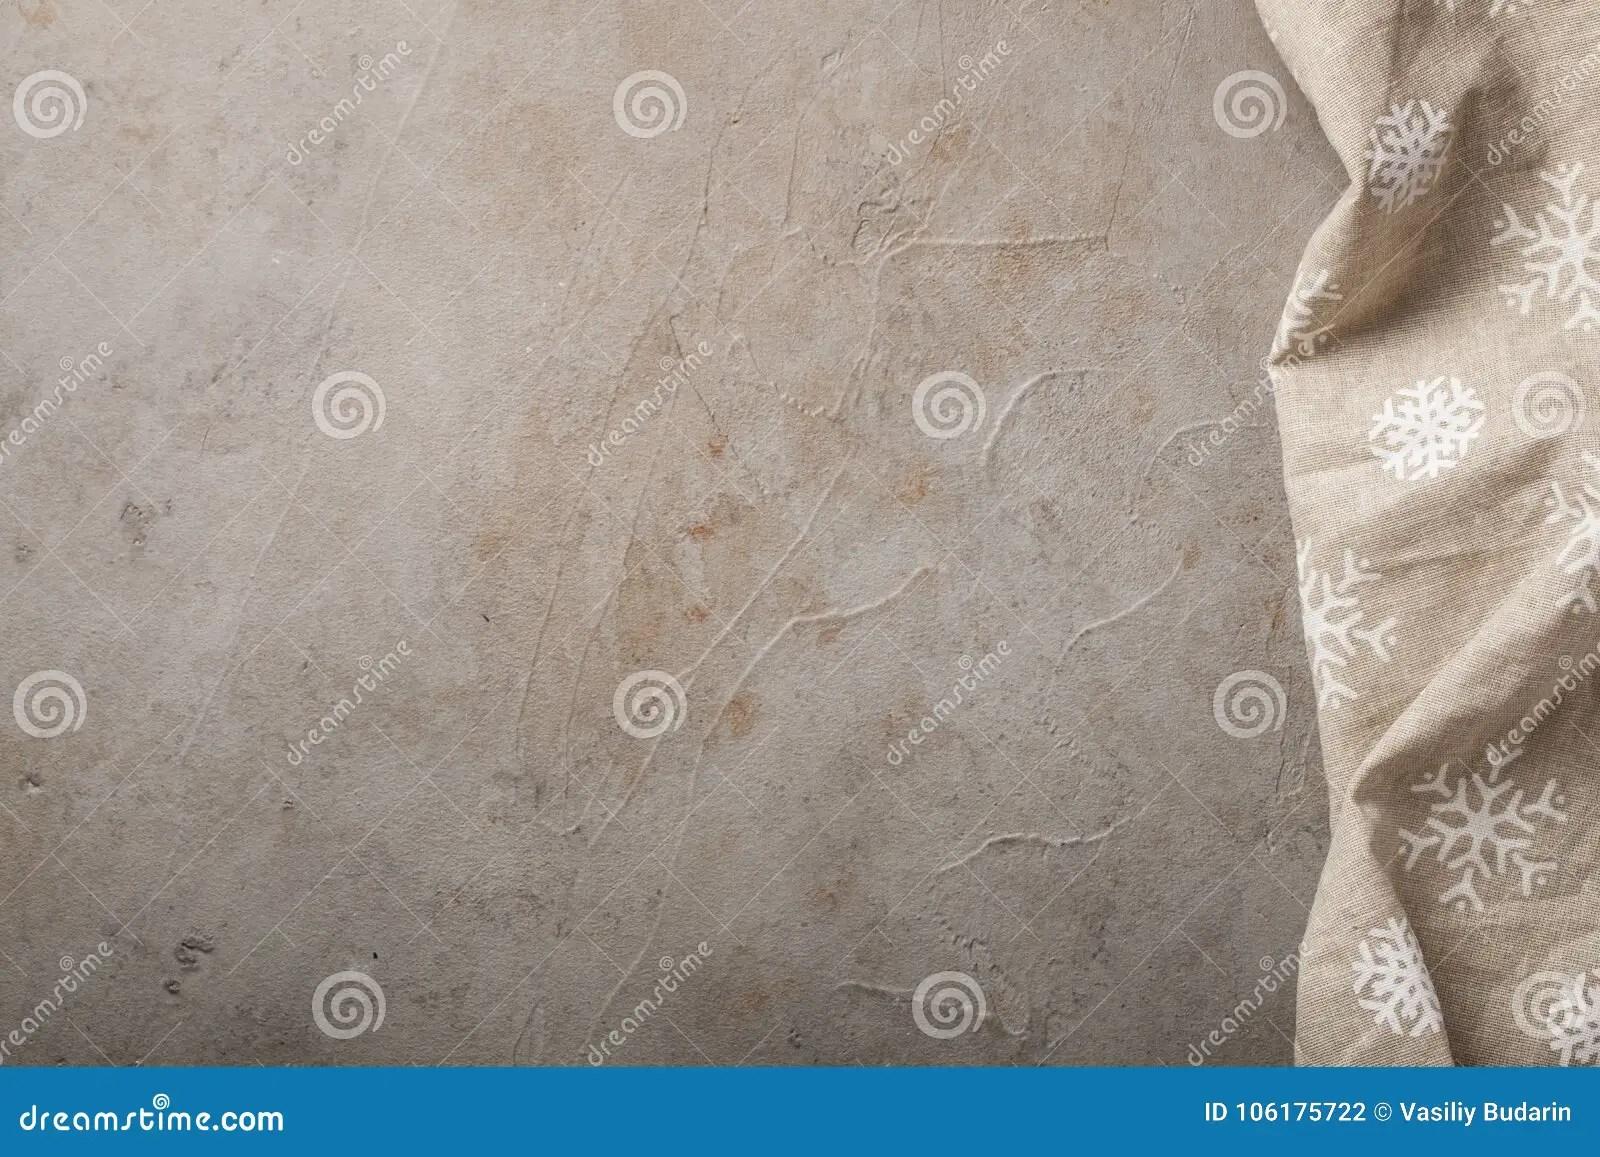 kitchen stone barn wood table 与毛巾的厨房石桌与拷贝空间的顶视图与有一点铁锈的具体米黄背景库存照片 与毛巾的厨房石桌与拷贝空间的顶视图与有一点铁锈